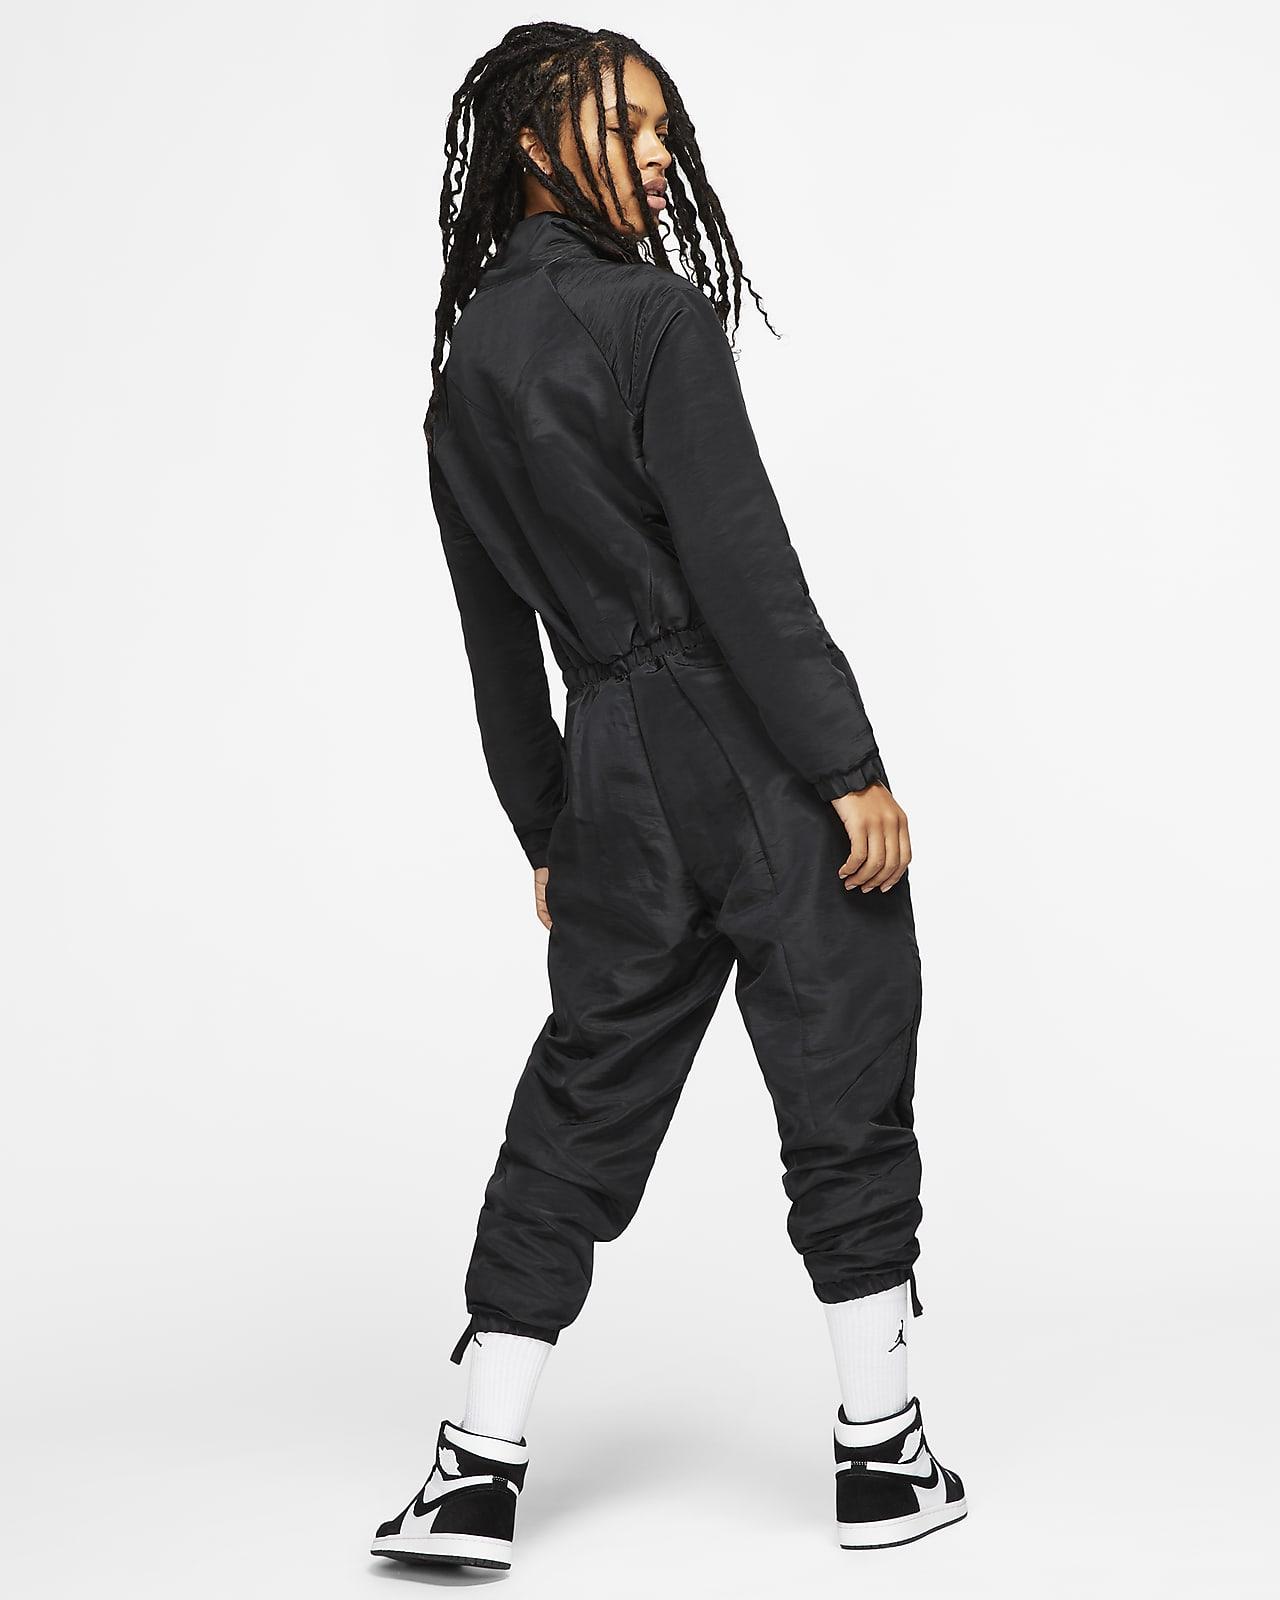 Jordan Women's Flight Suit. Nike AE